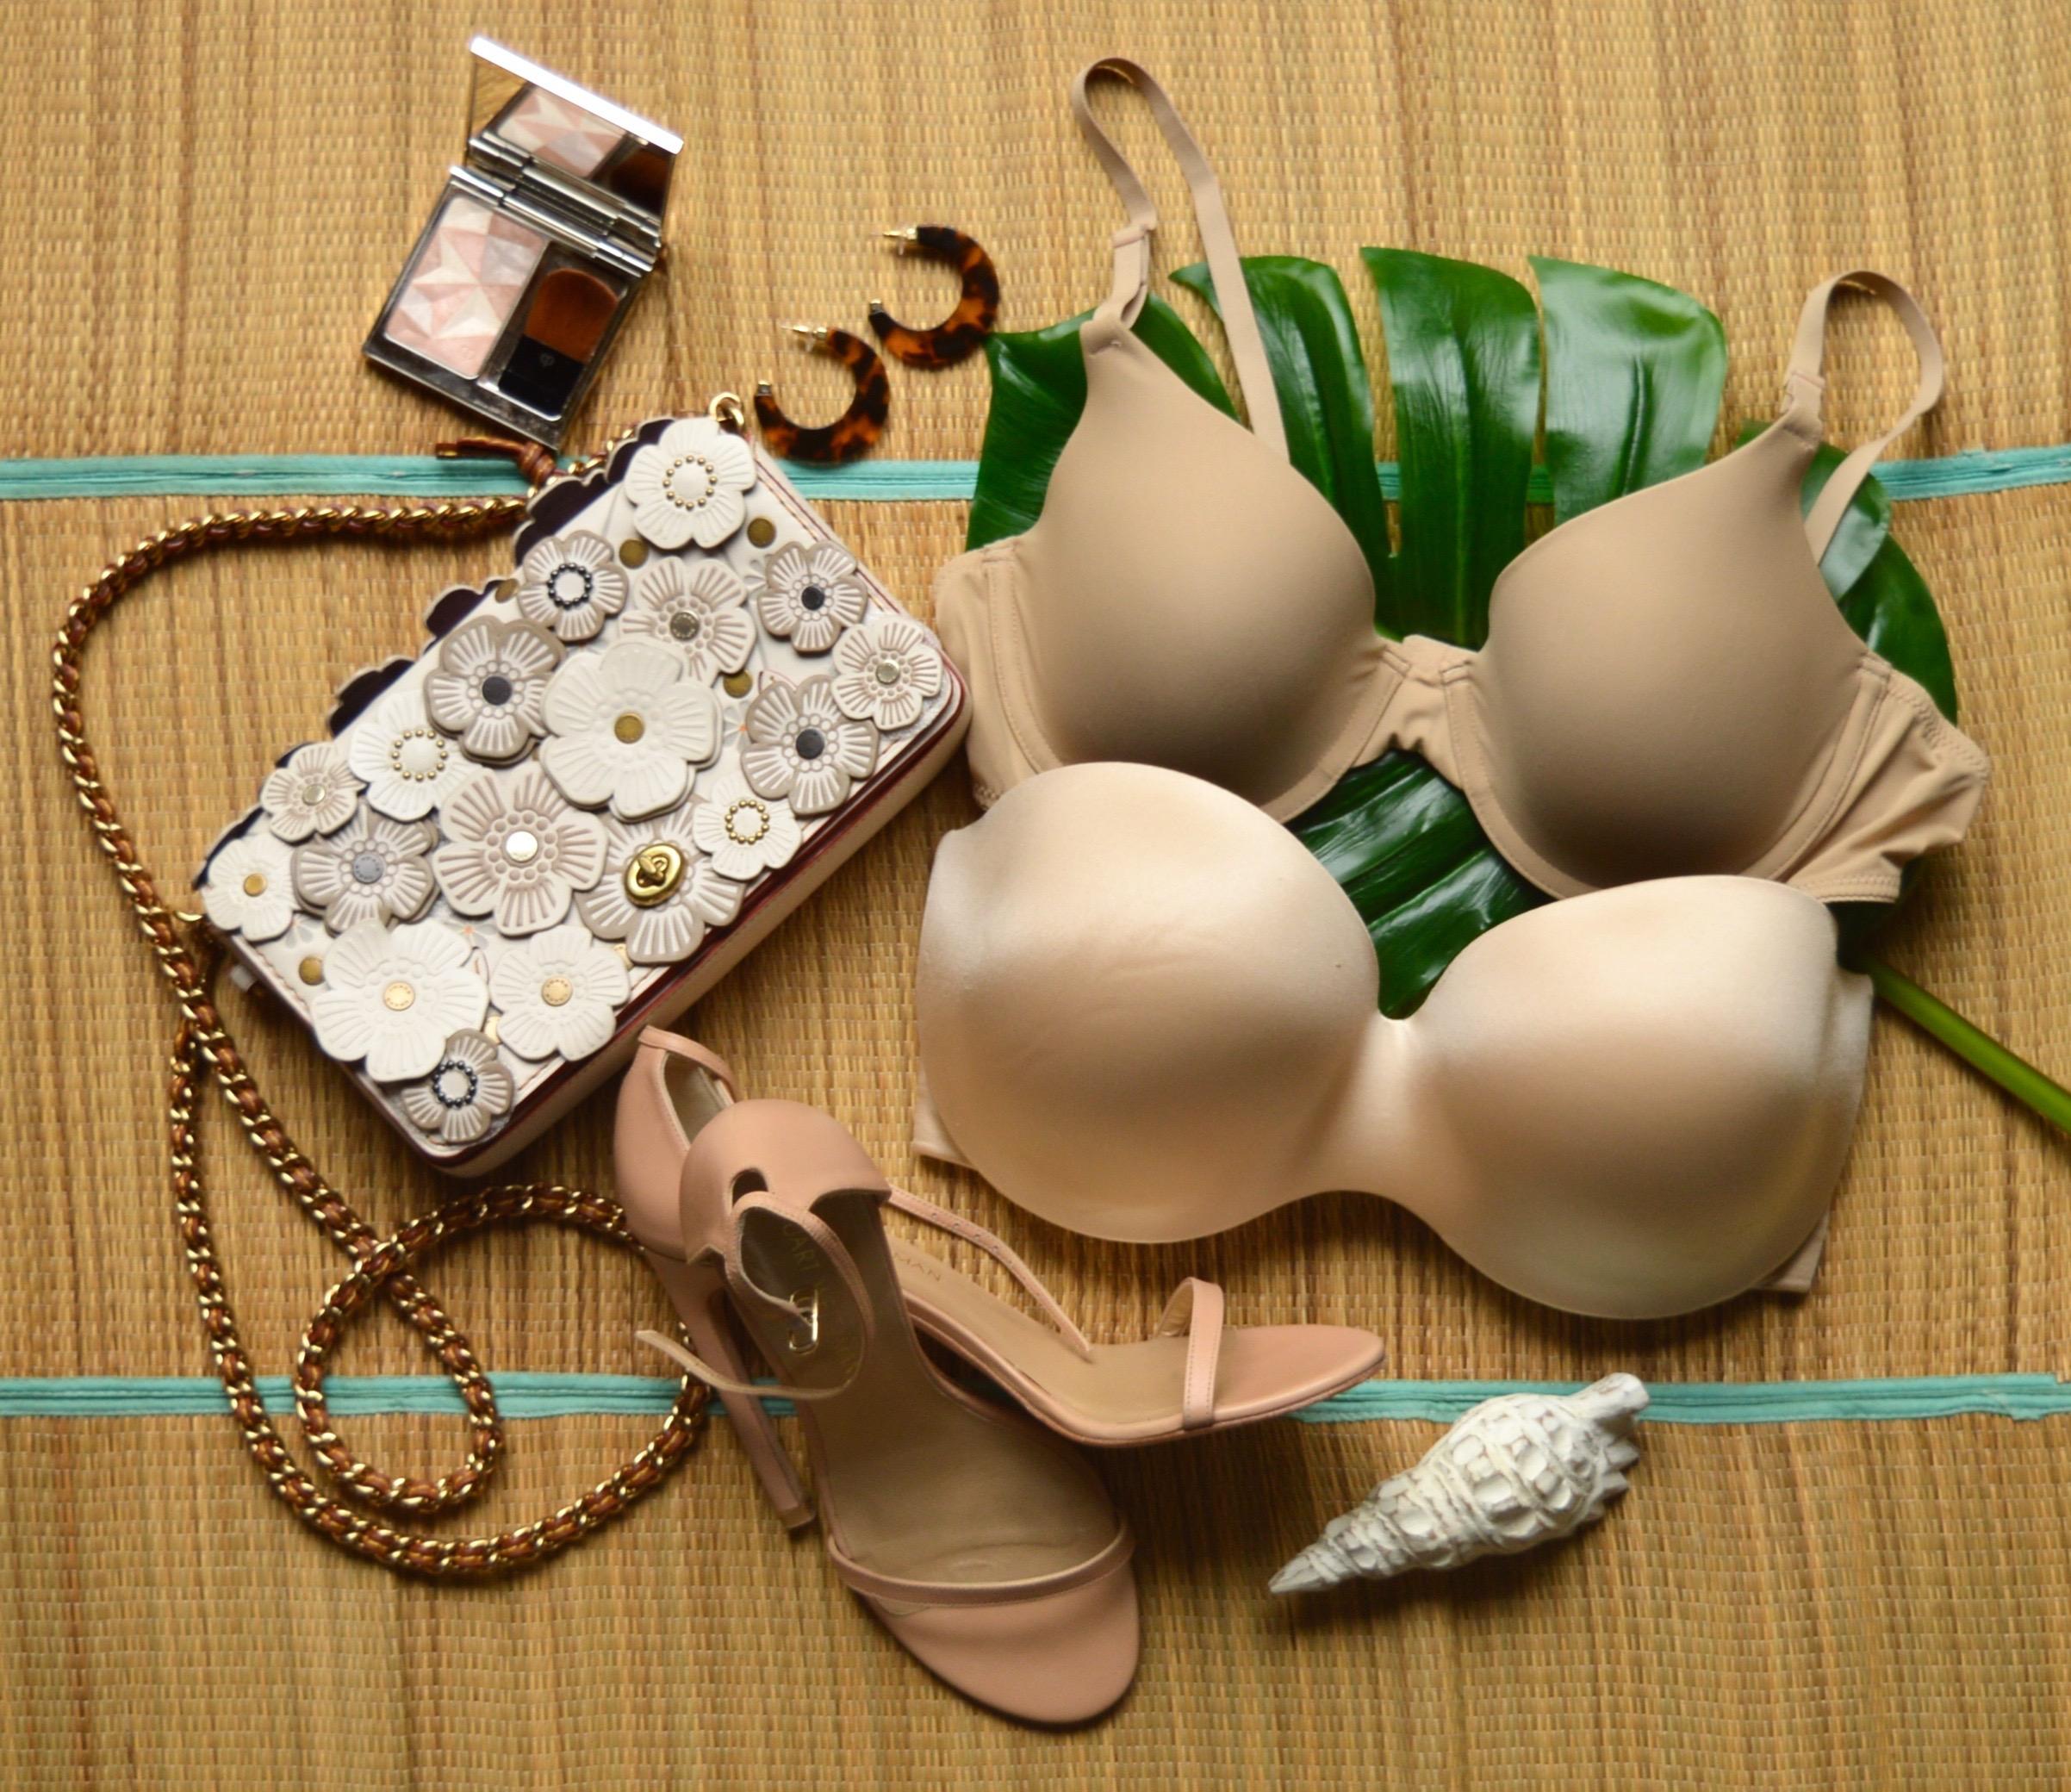 panties, bras, sport bras, strapless bras, t-shirt bras,